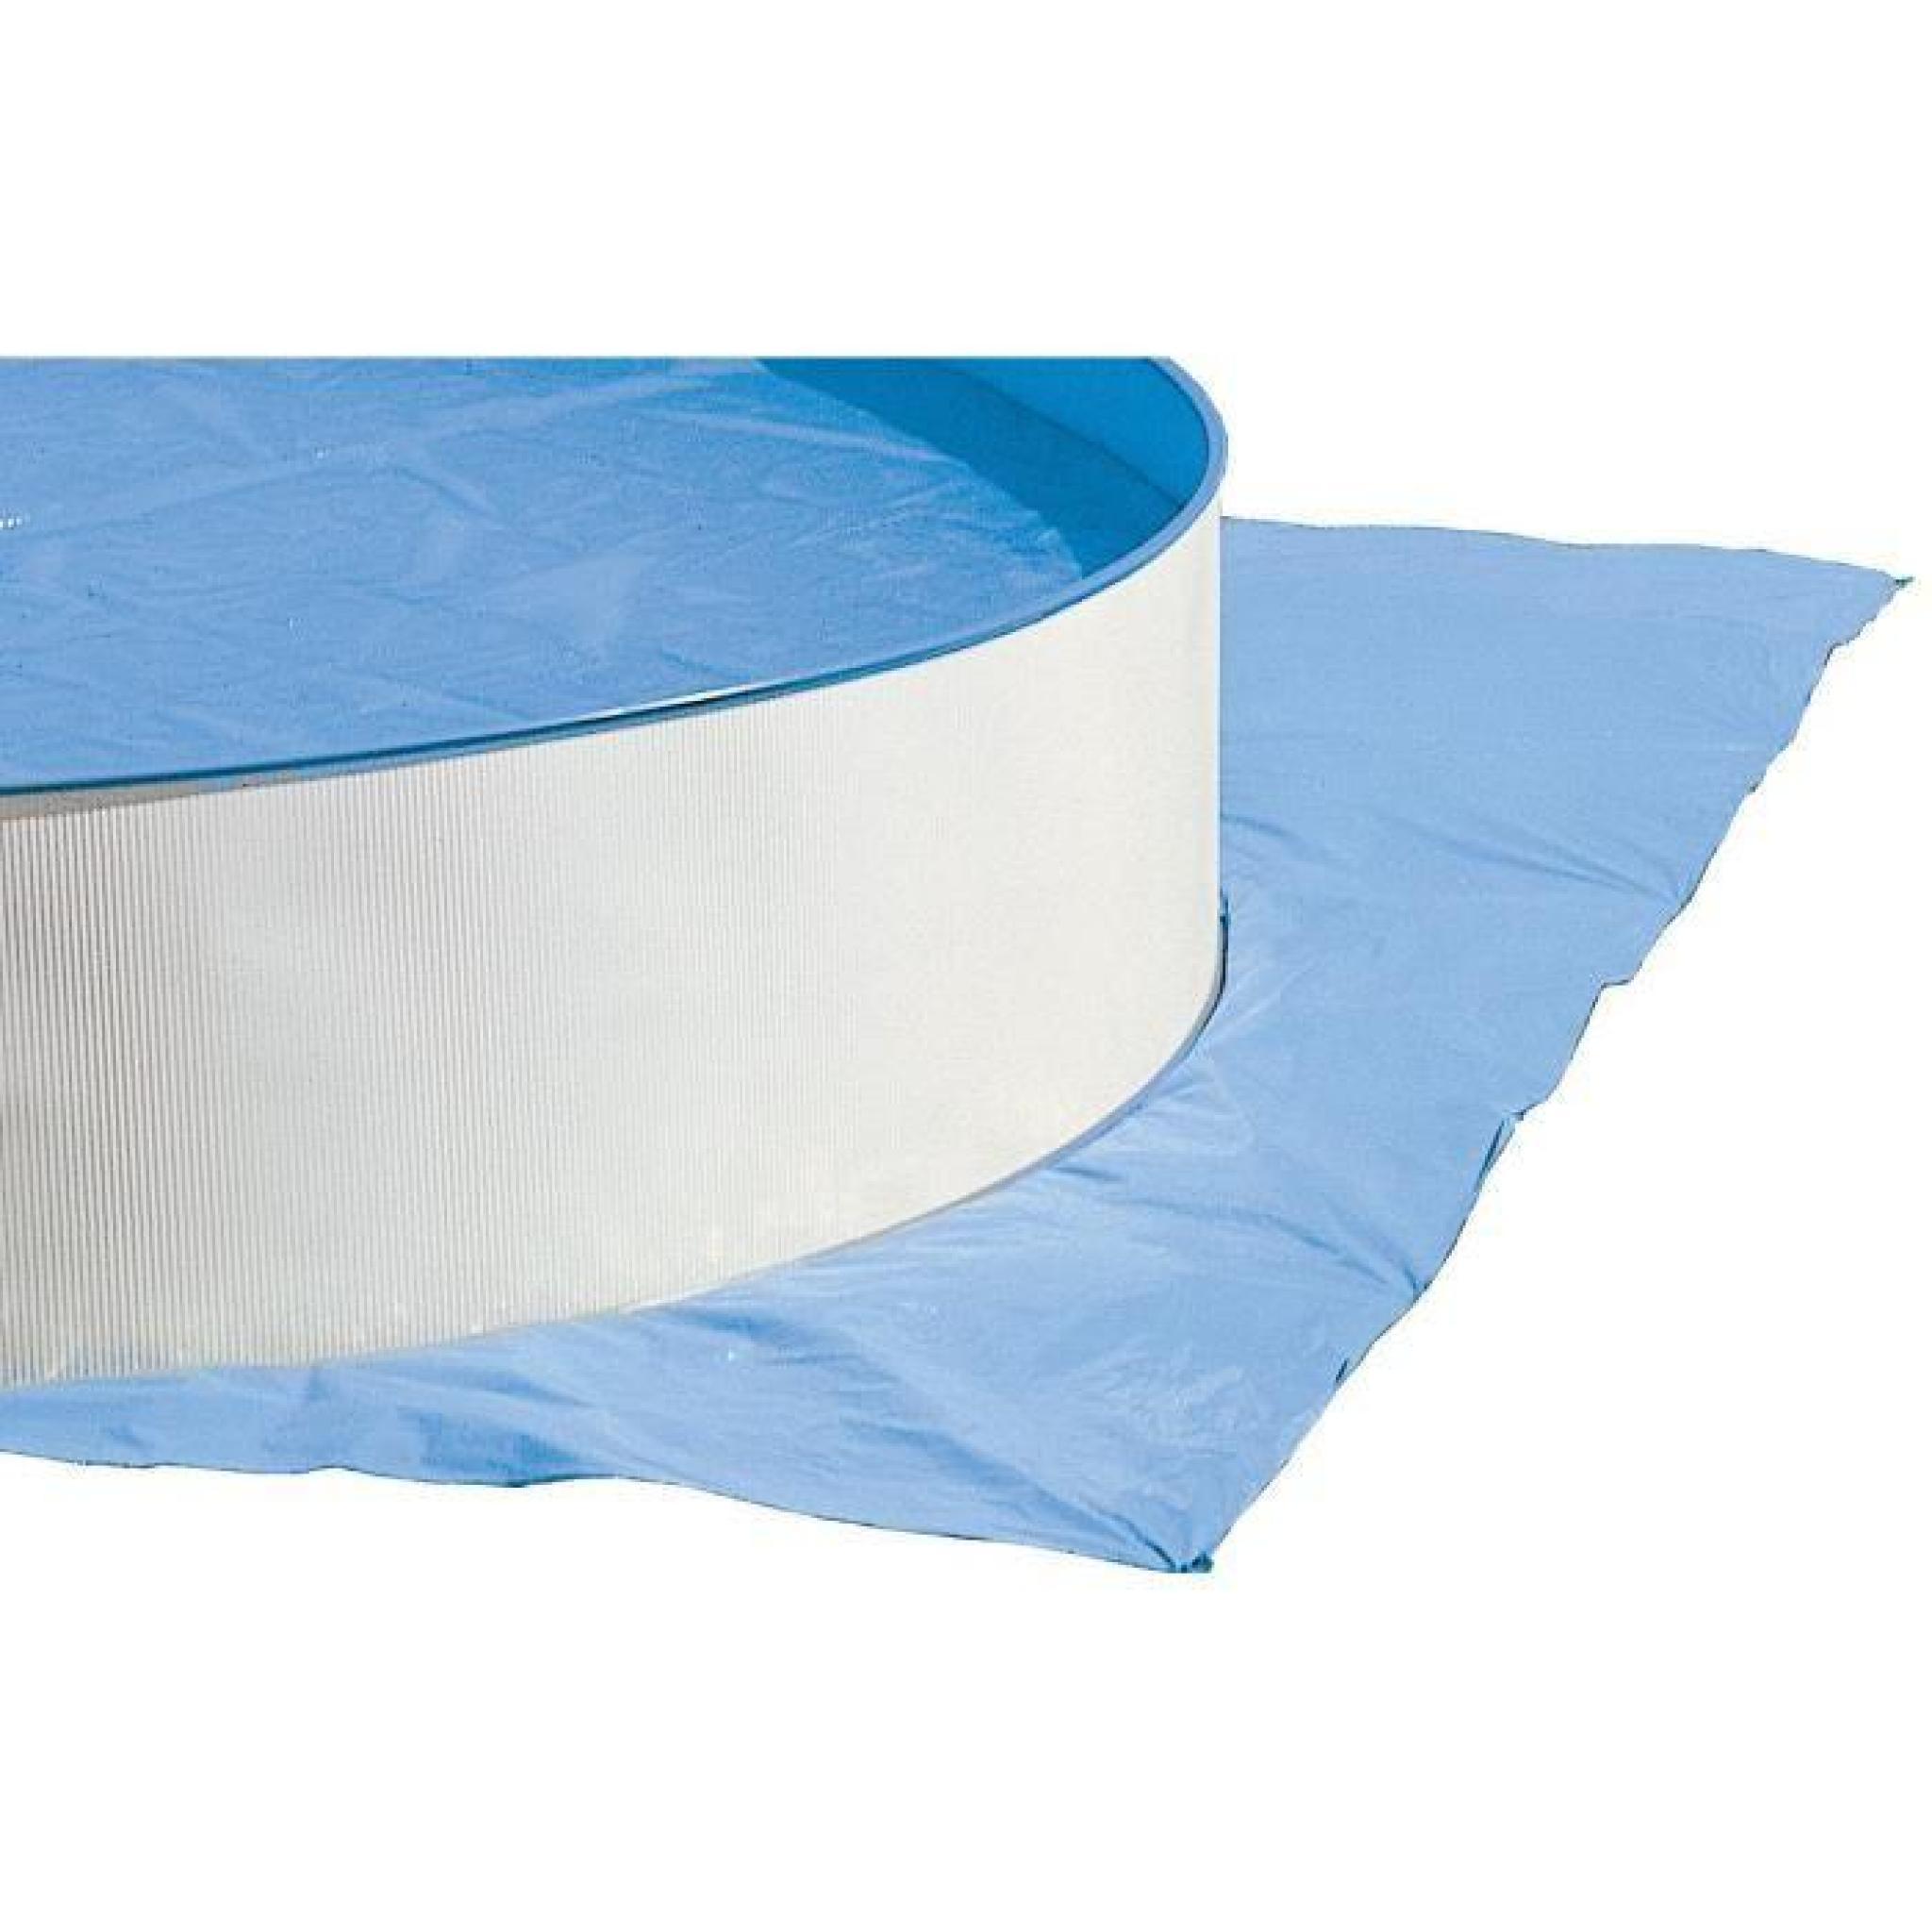 Prestigio piscine ovale en acier avec tapis 730x366x120cm - Piscine hors sol acier pas cher ...